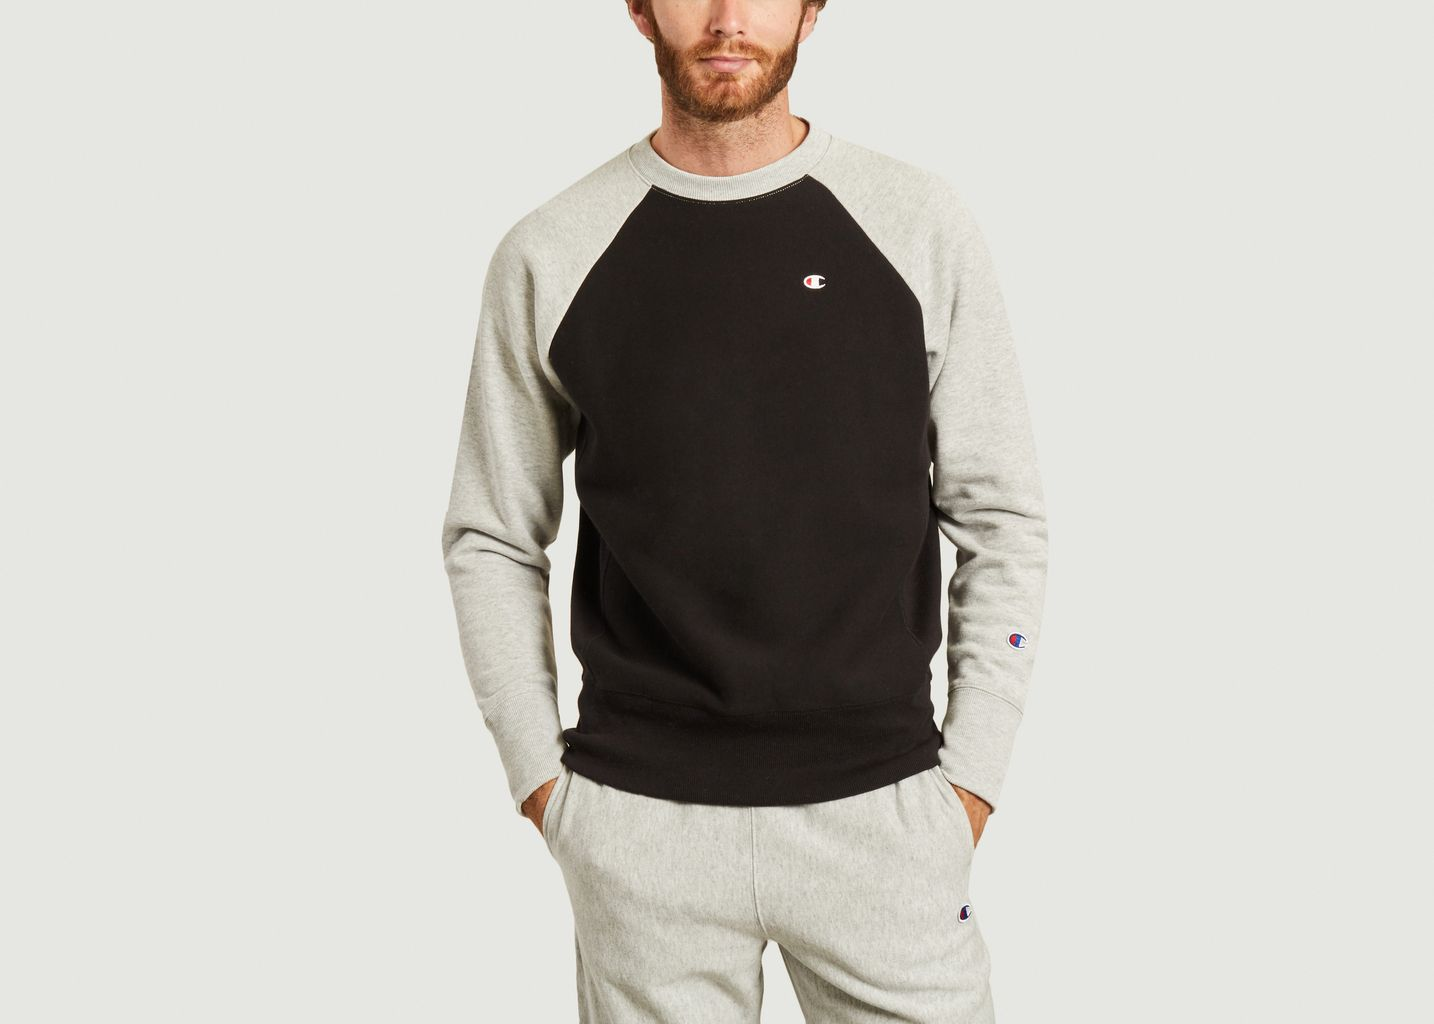 Sweatshirt bicolore siglé - Champion